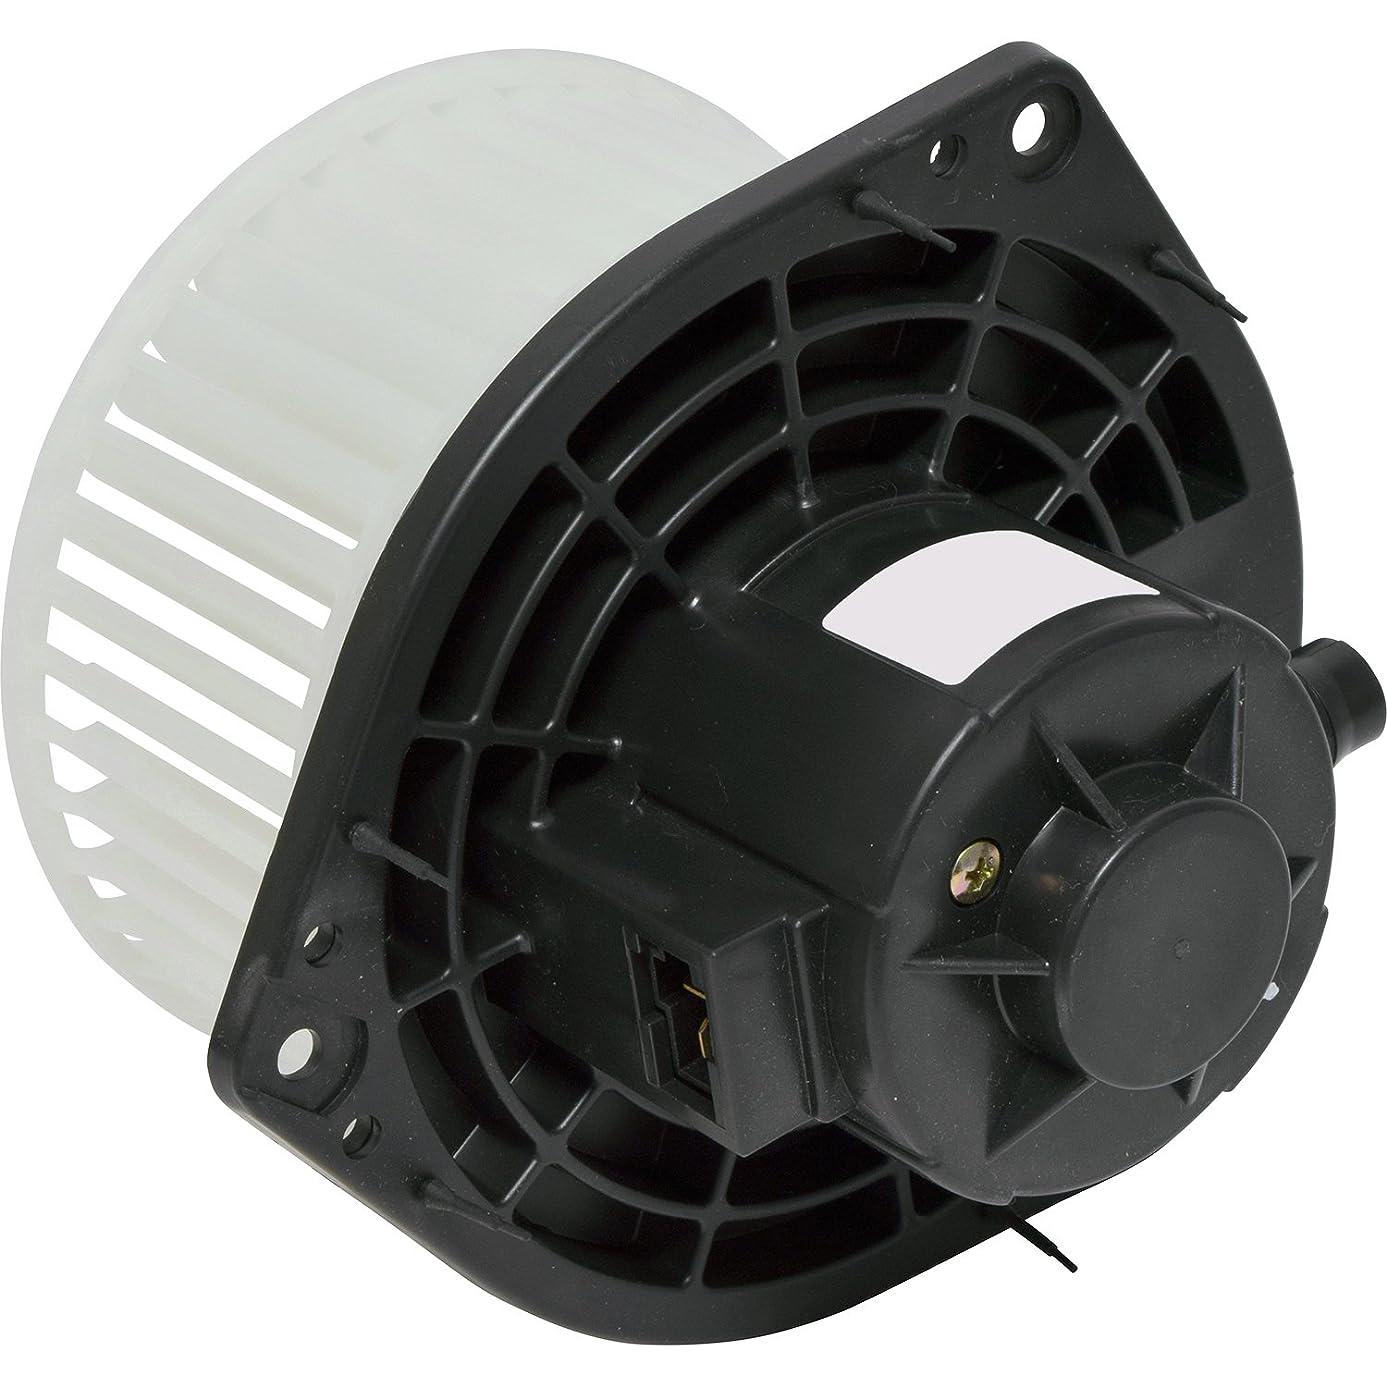 Universal Air Conditioner BM 9312C HVAC Blower Motor